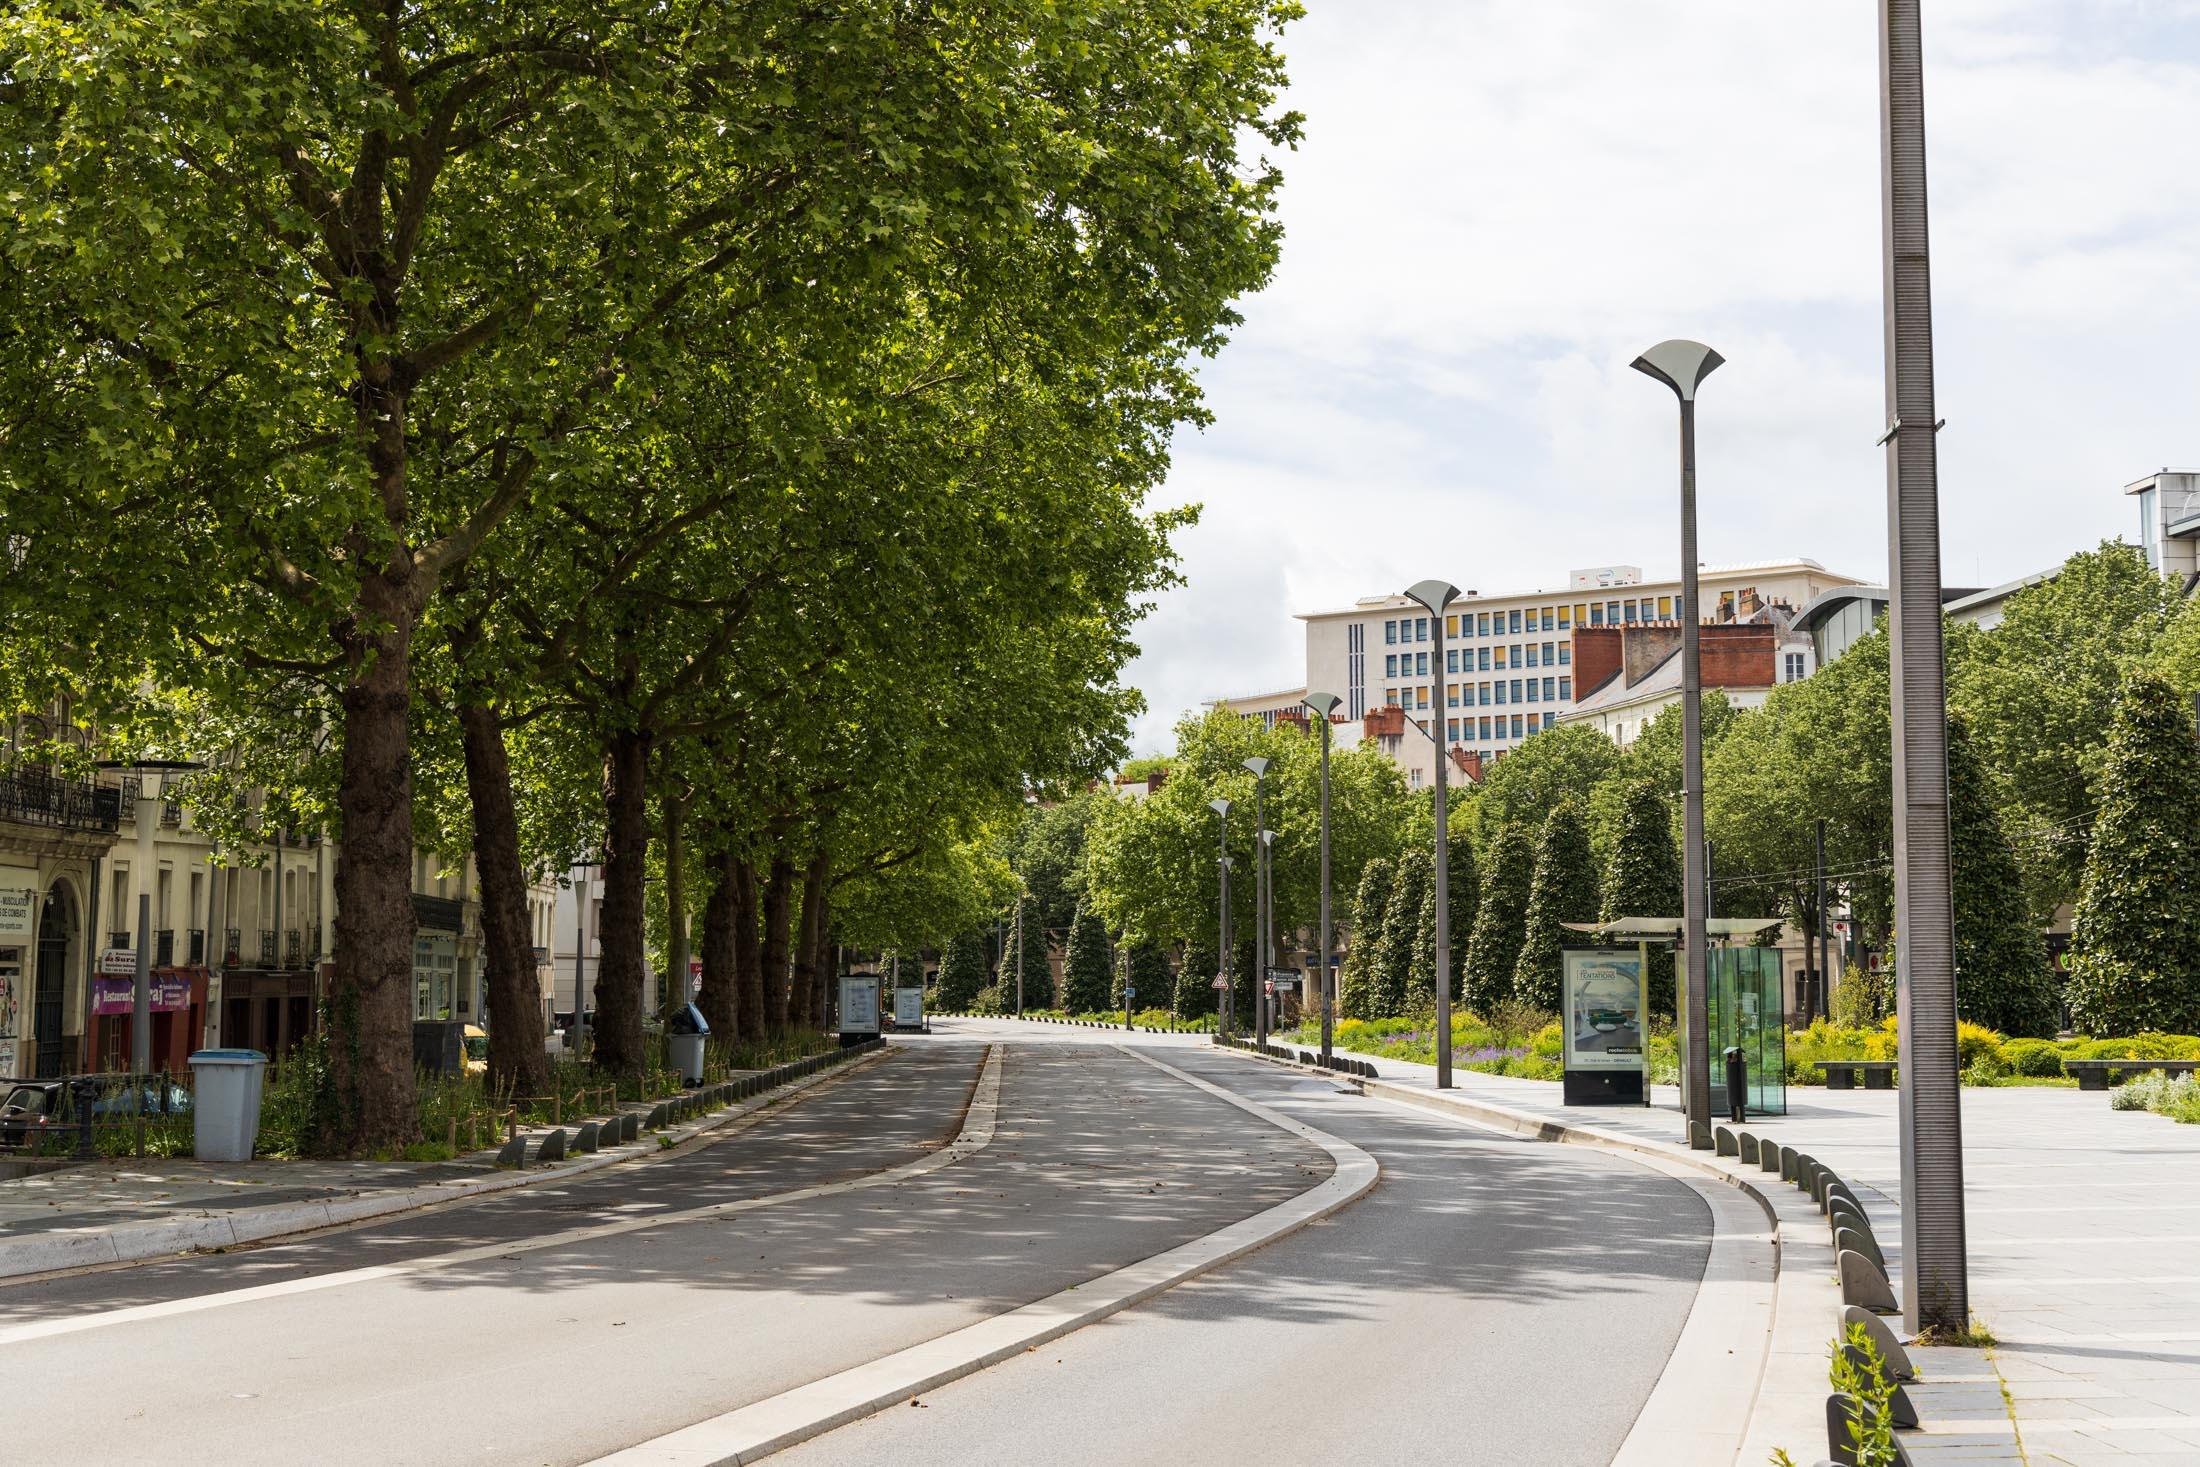 Cours des 50 otages in Nantes is empty. Nantes, France - May 1st 2020.Le cours des 50 otages est vide. Nantes, France - 1er Mai 2020.